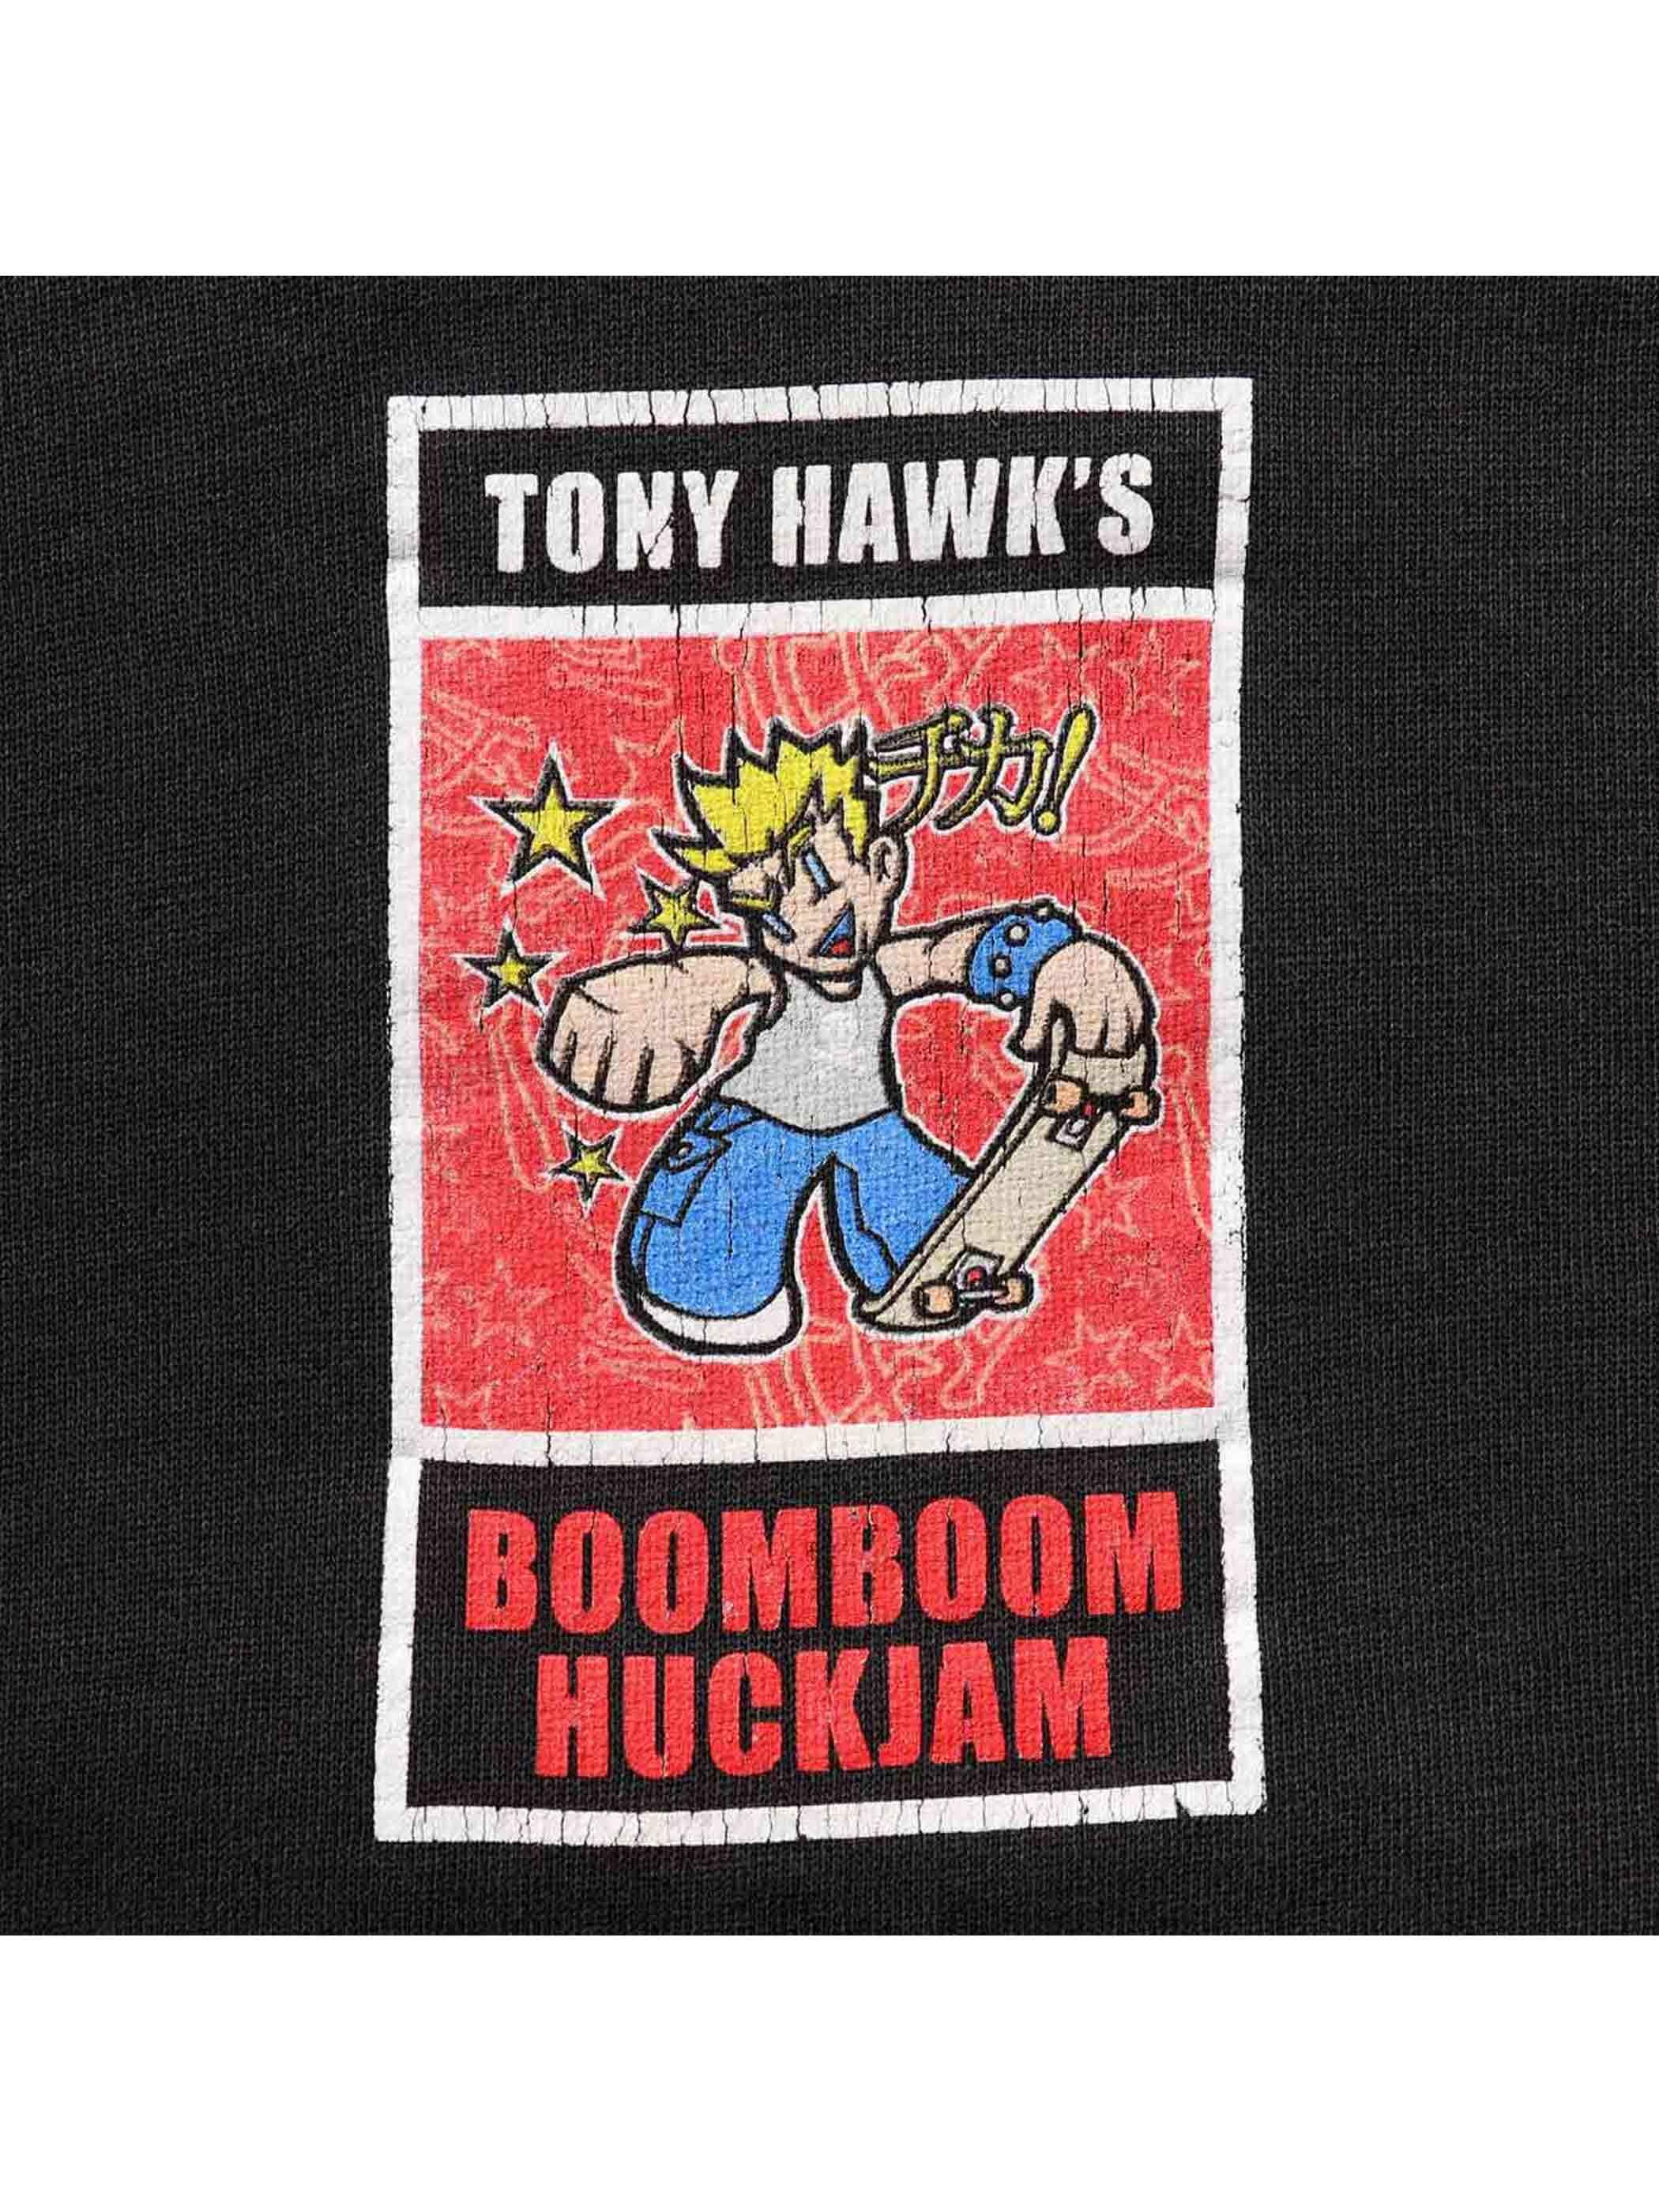 "00's QUIKSILVER ""TONY HAWK'S BOOM BOOM HUCKJAM"" プルオーバーパーカー [L]"